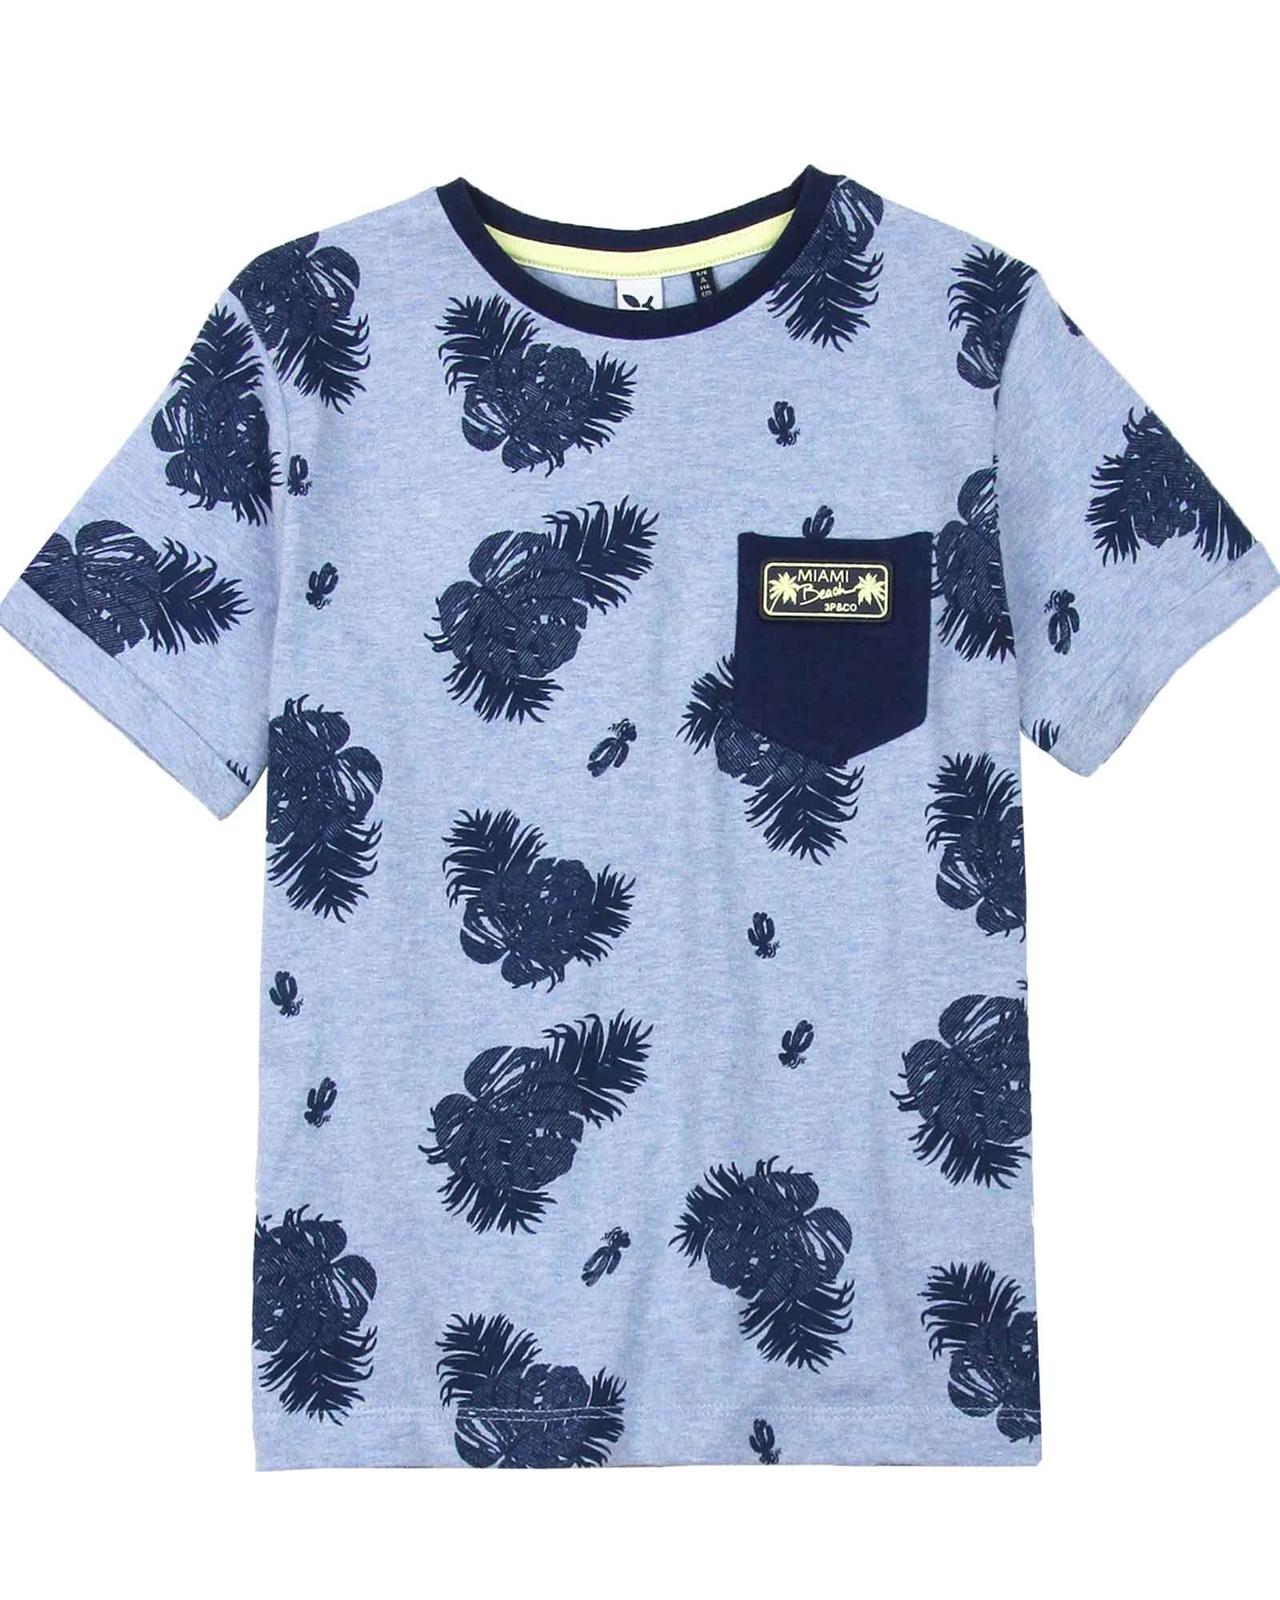 90d89b8b3 3POMMES Boy's T-shirt with Pocket Miami Vice, Sizes 4-12